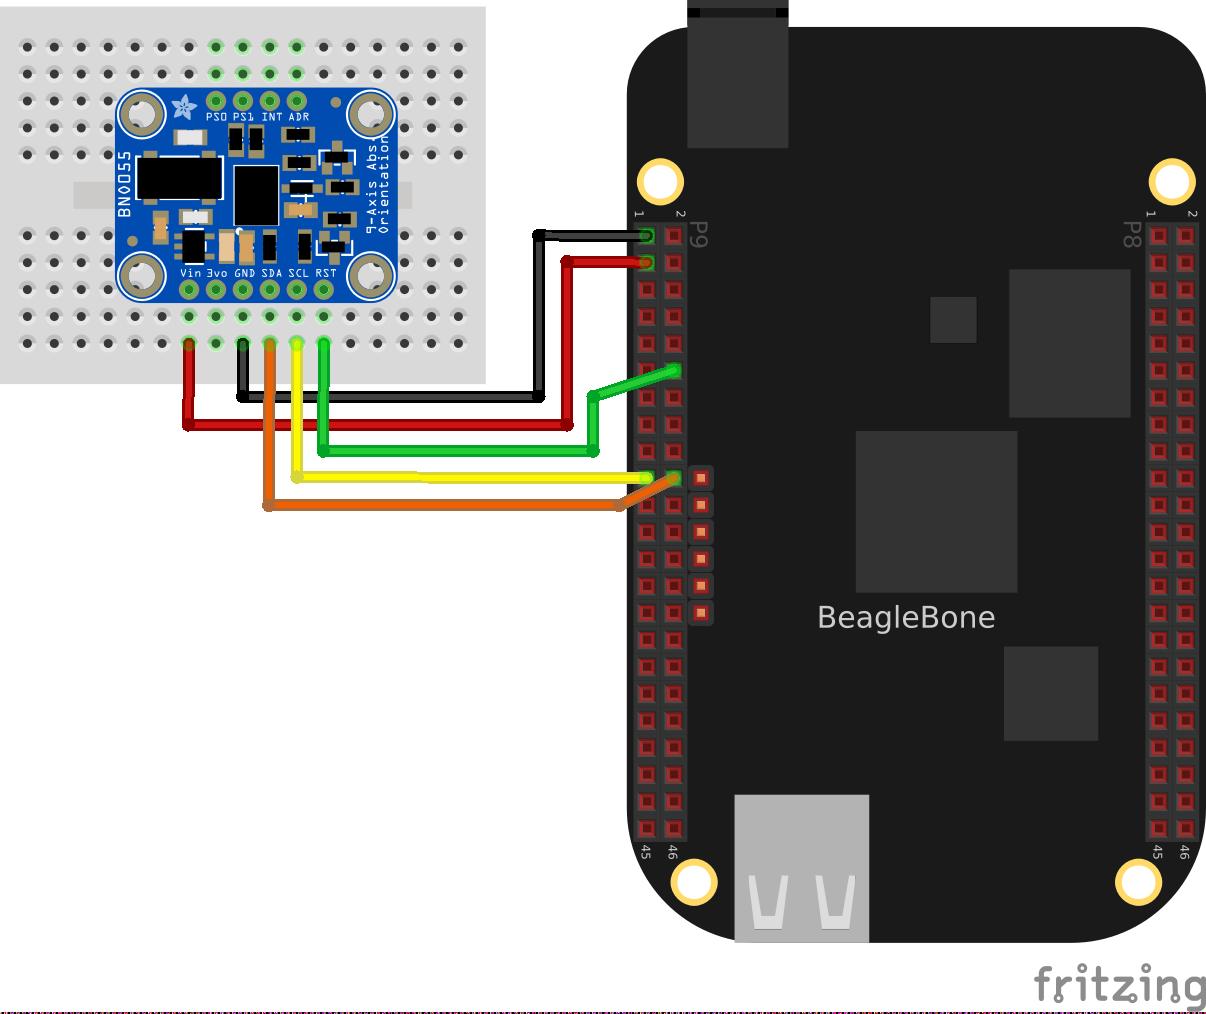 sensors_beaglebone_black_bb.png